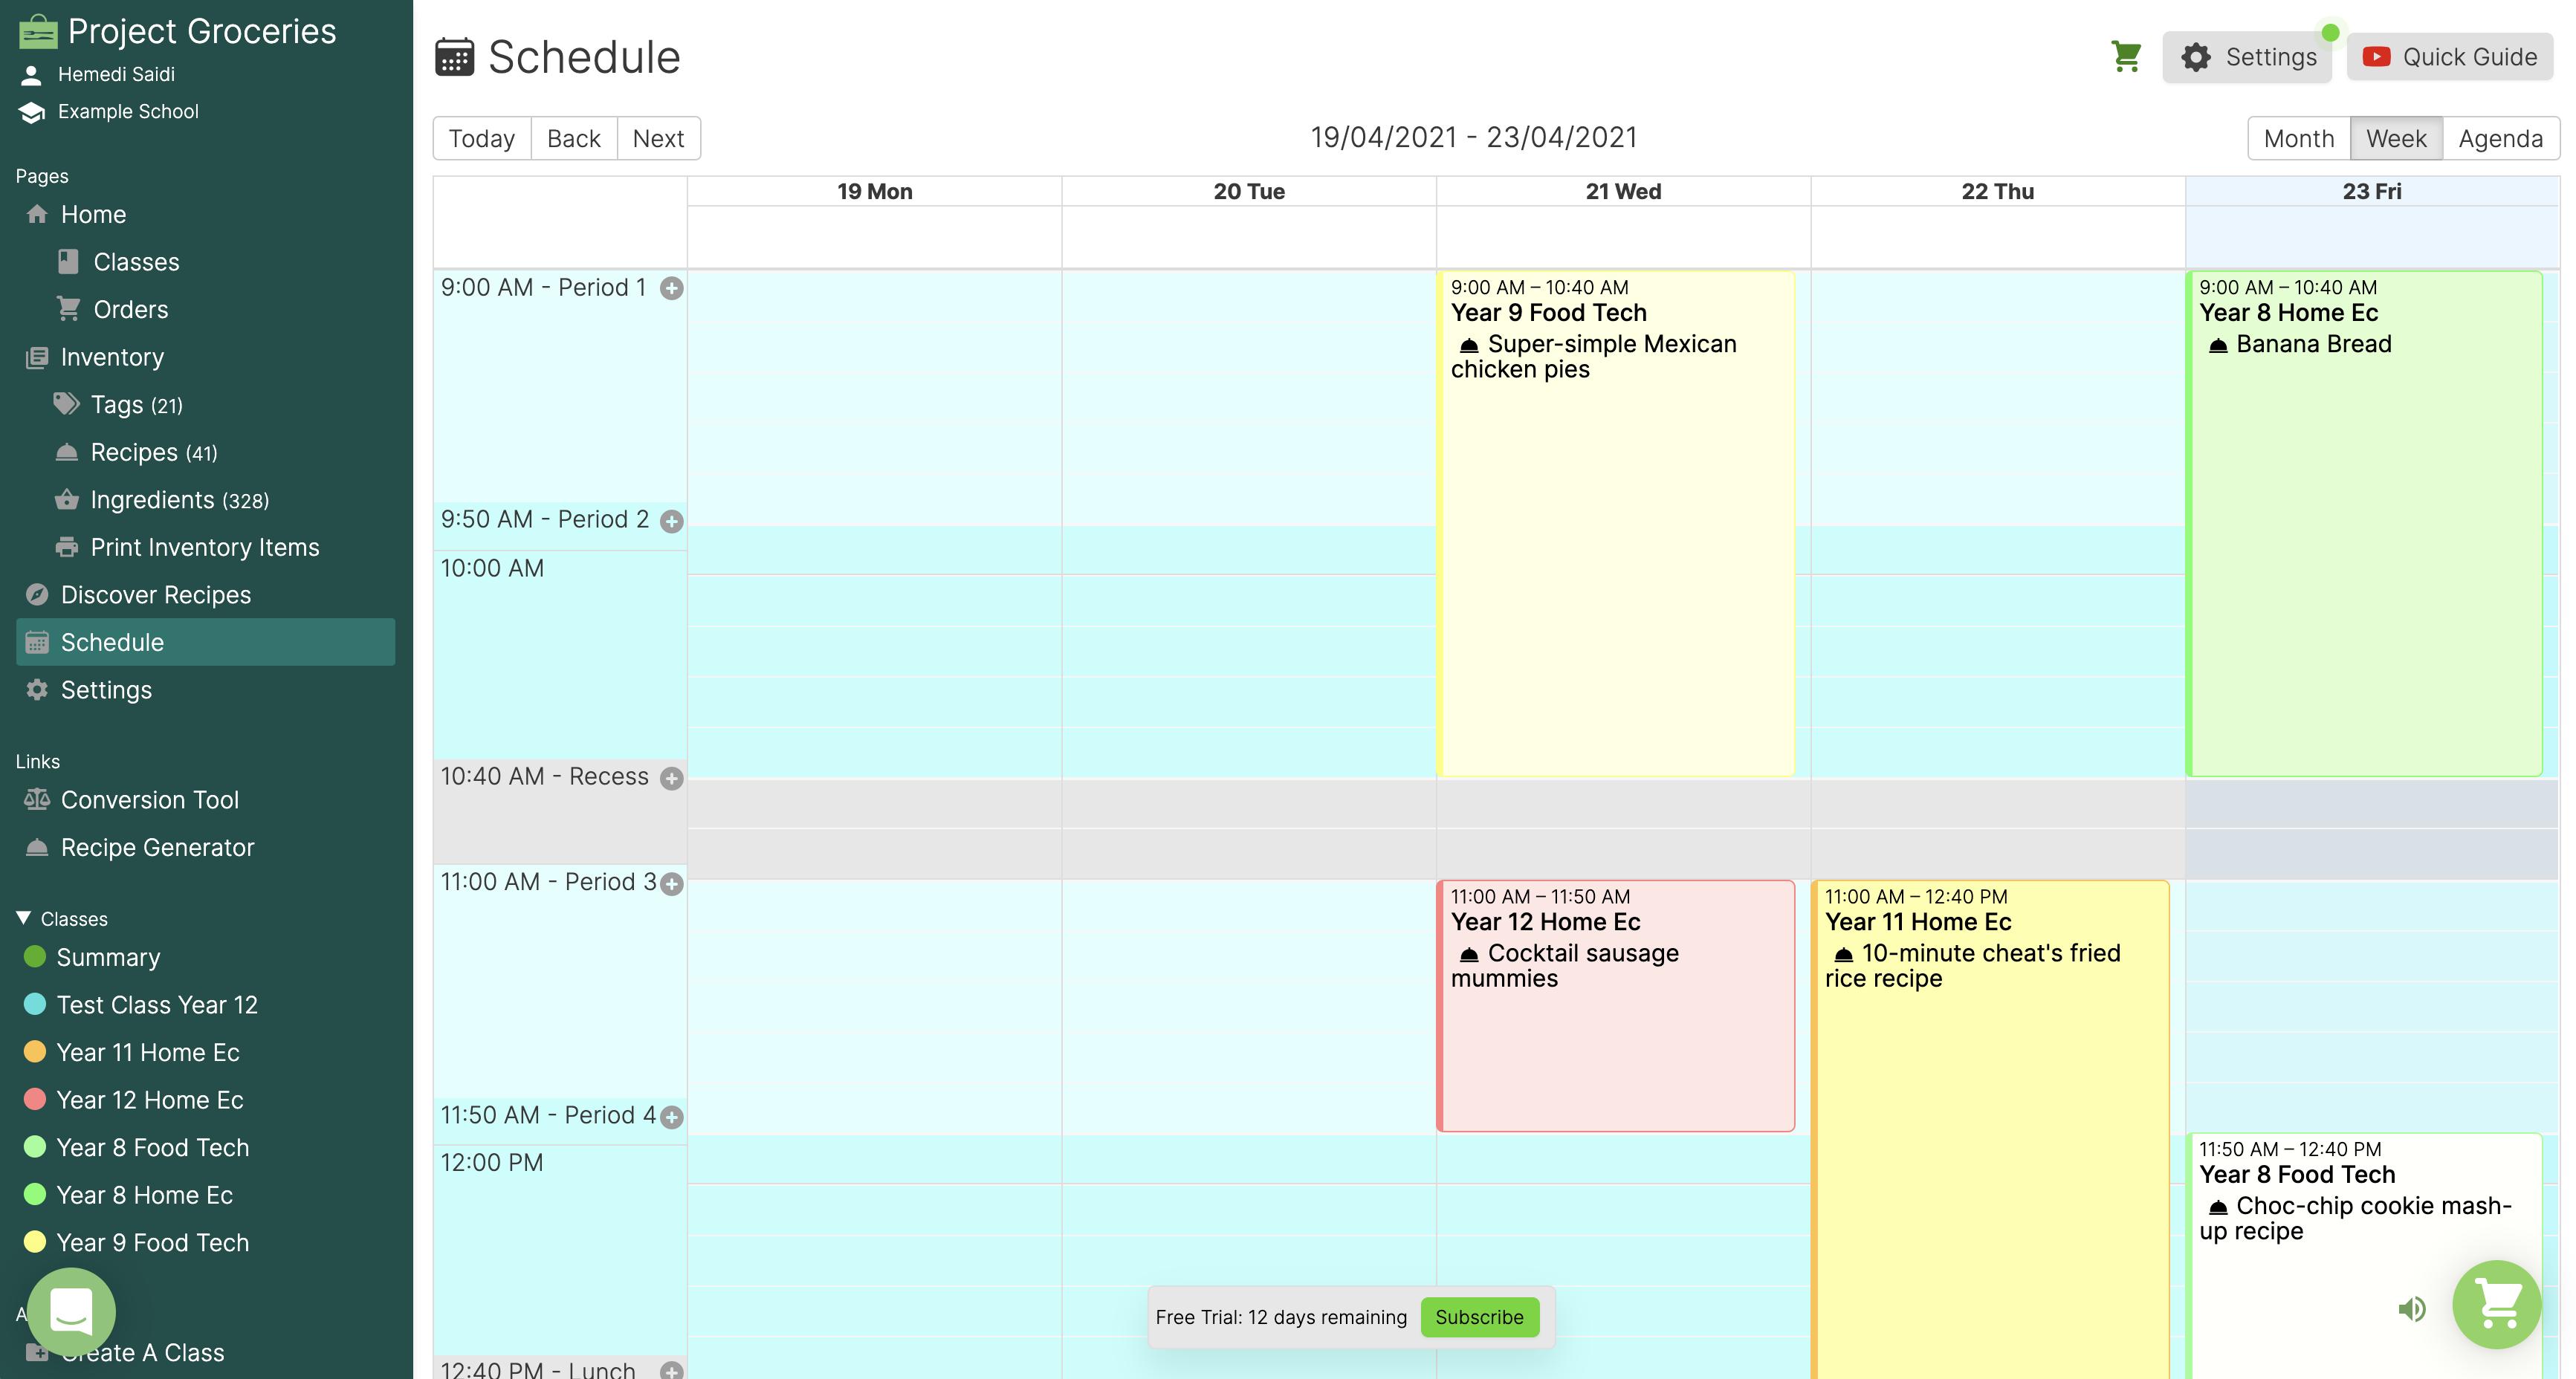 Schedule user interface